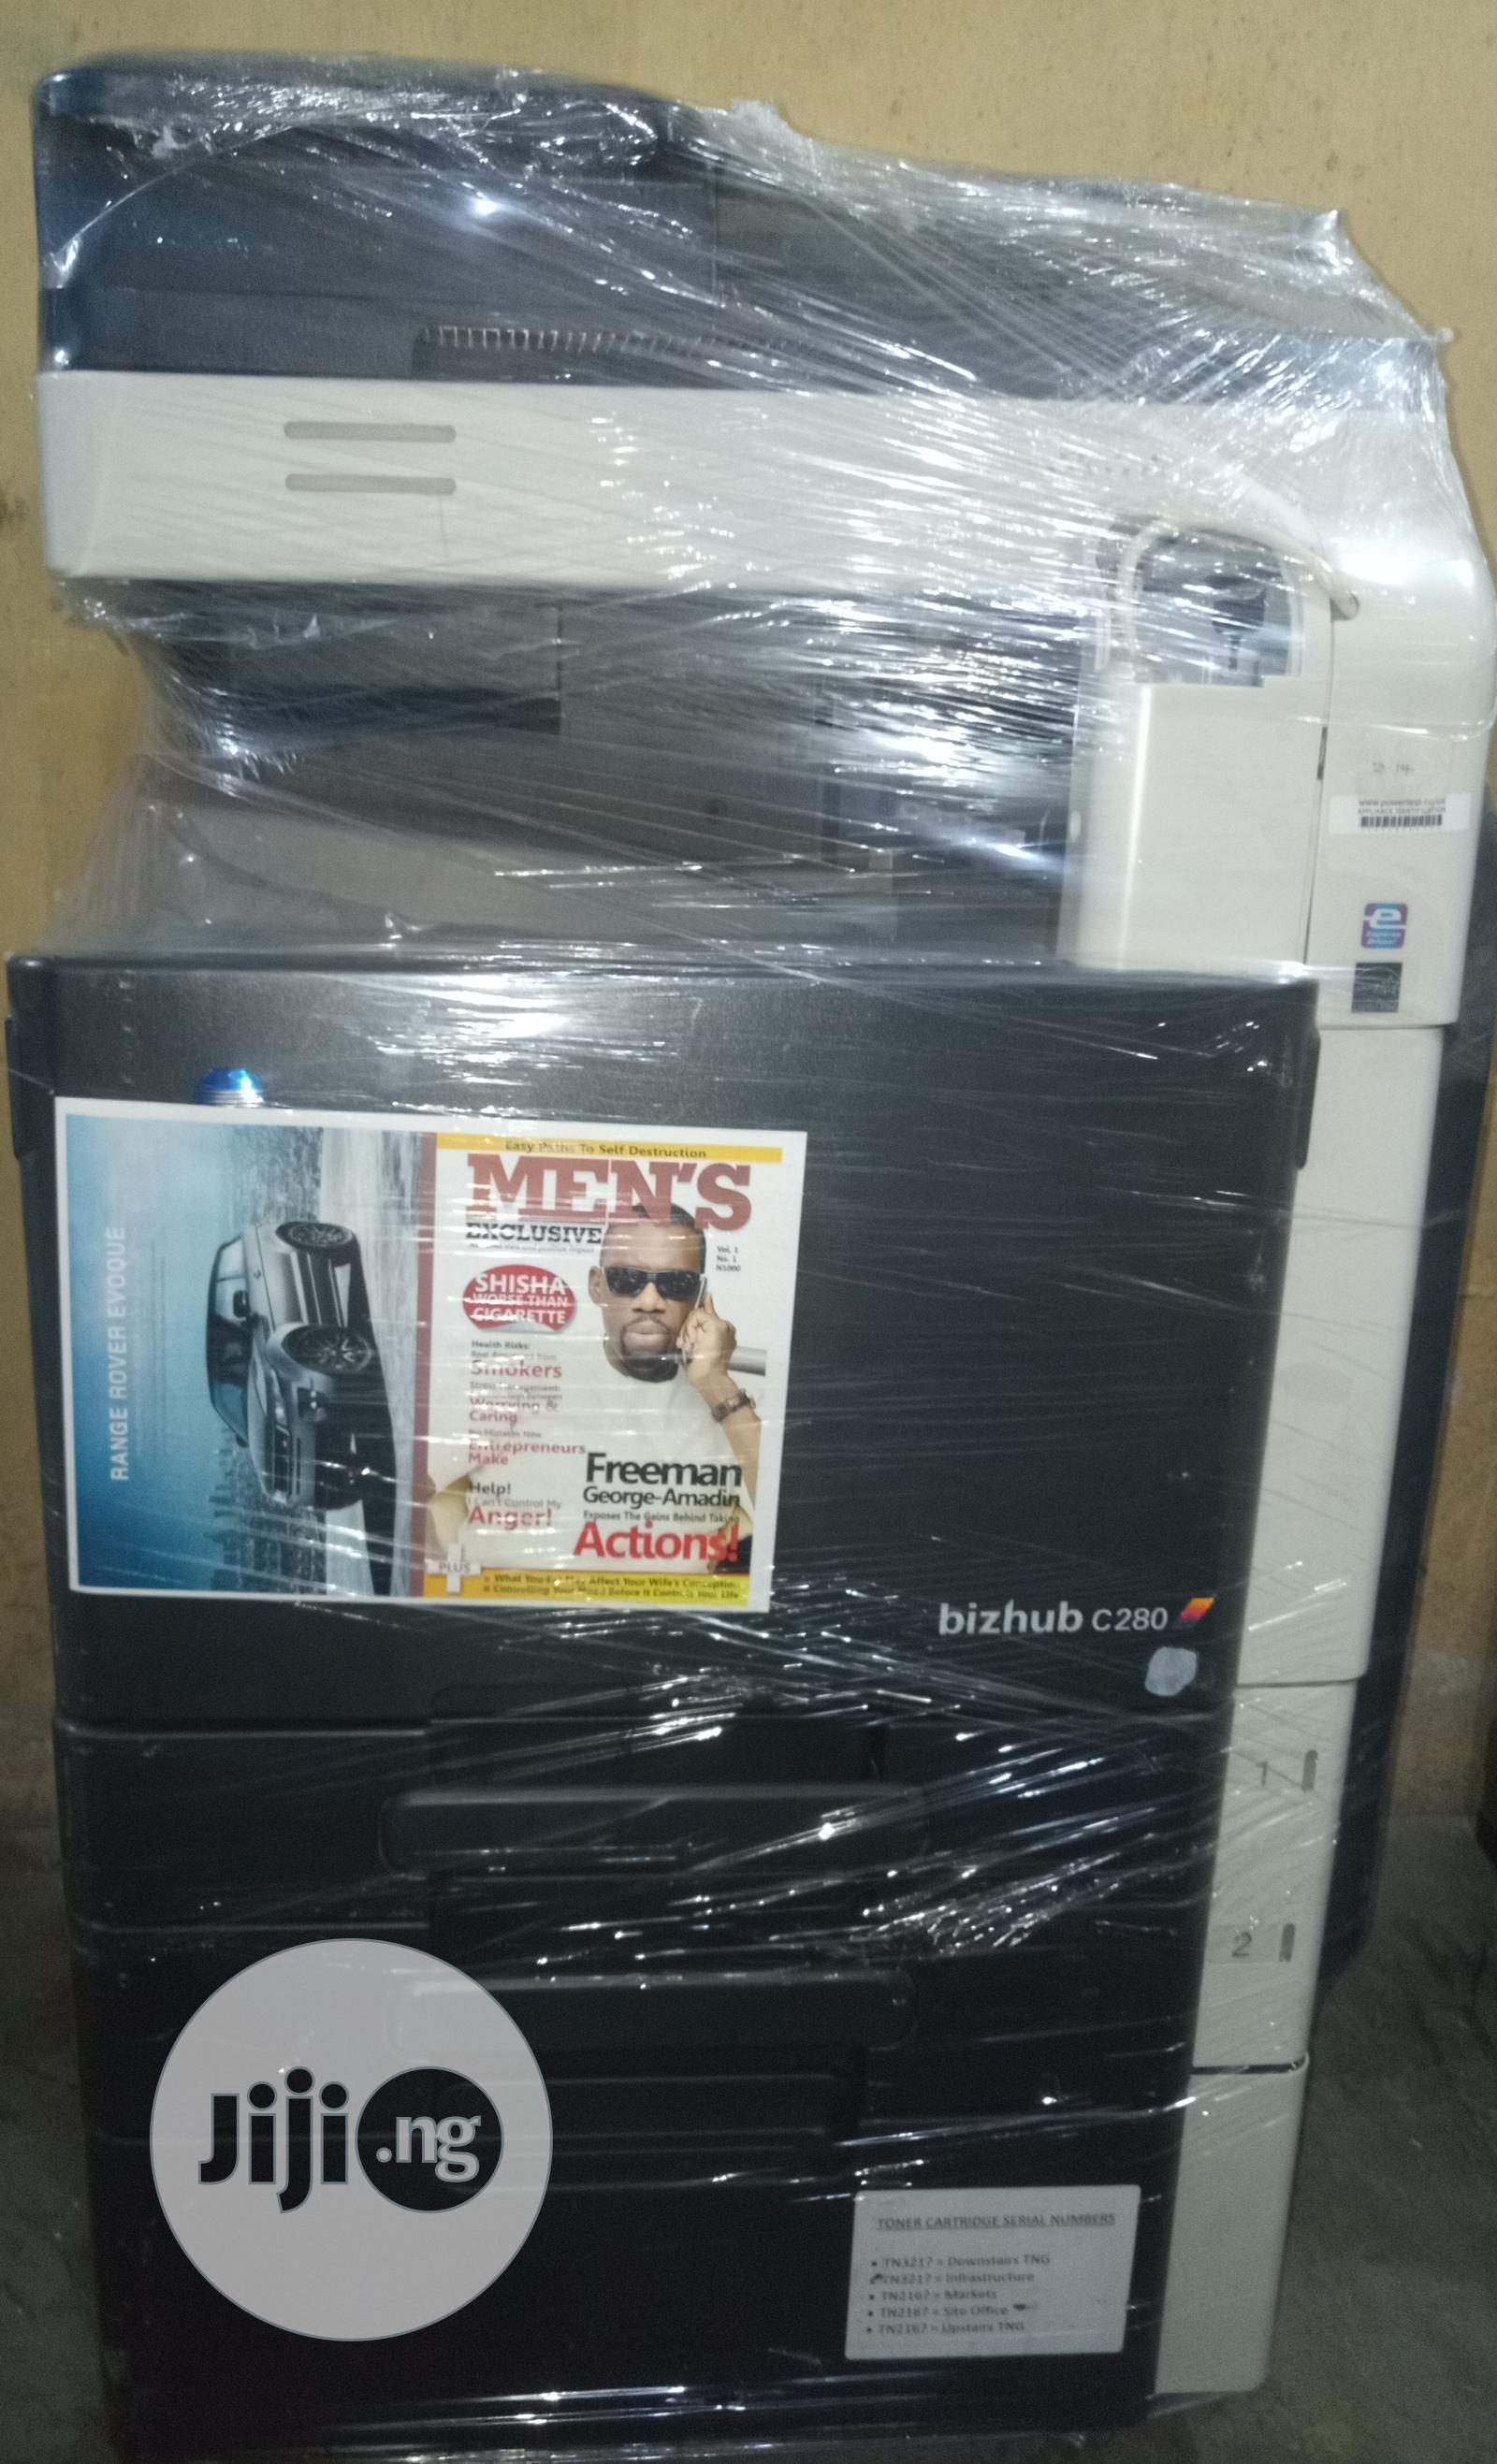 Konica Minolta Bizhub C280 Colour Multifunctional Printer